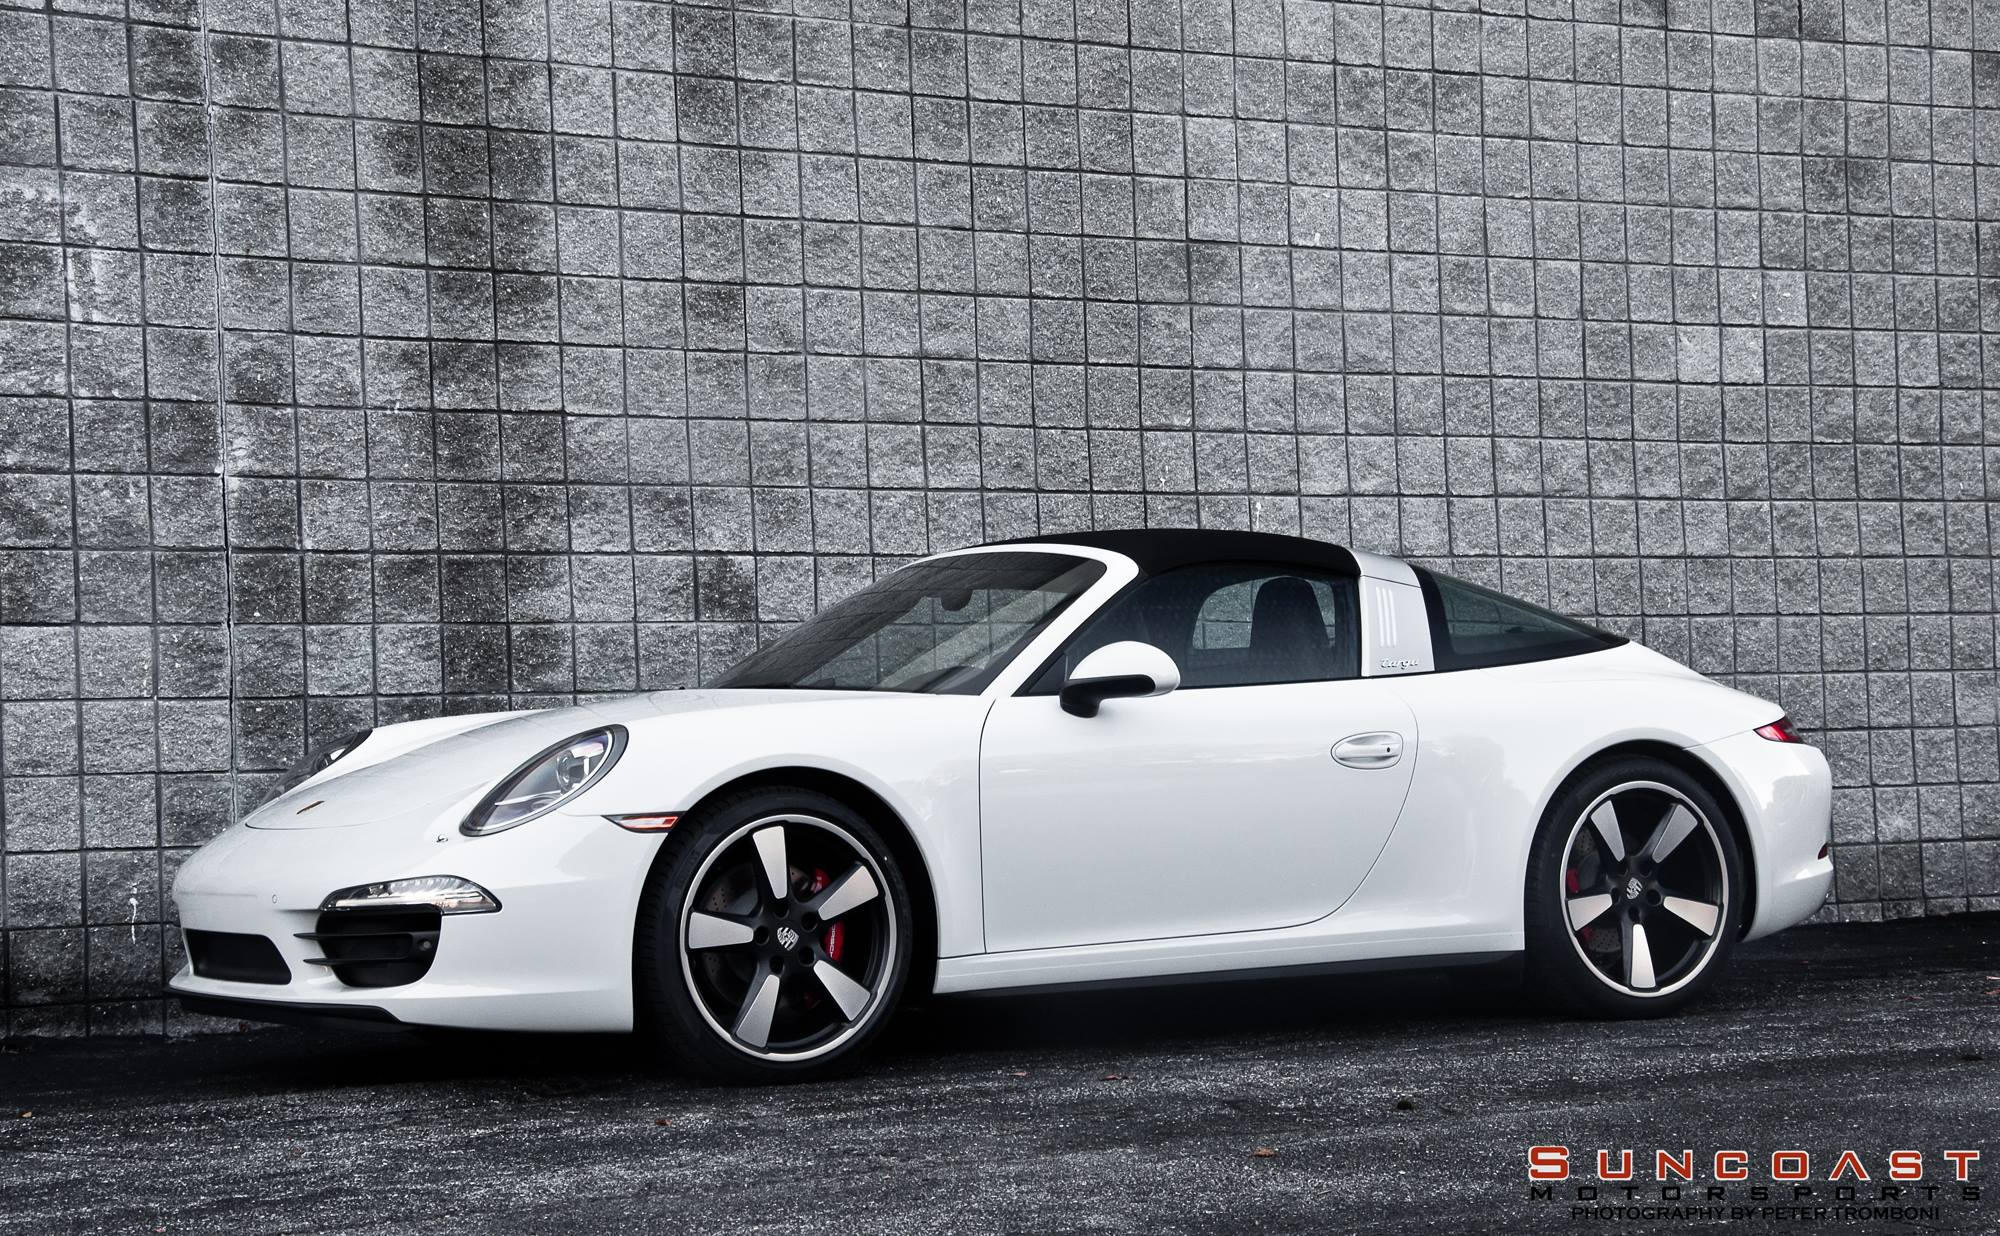 porsche 911 targa fuchs 50th wheels anniversary edition shines 4s classic wheel editions rims autoevolution